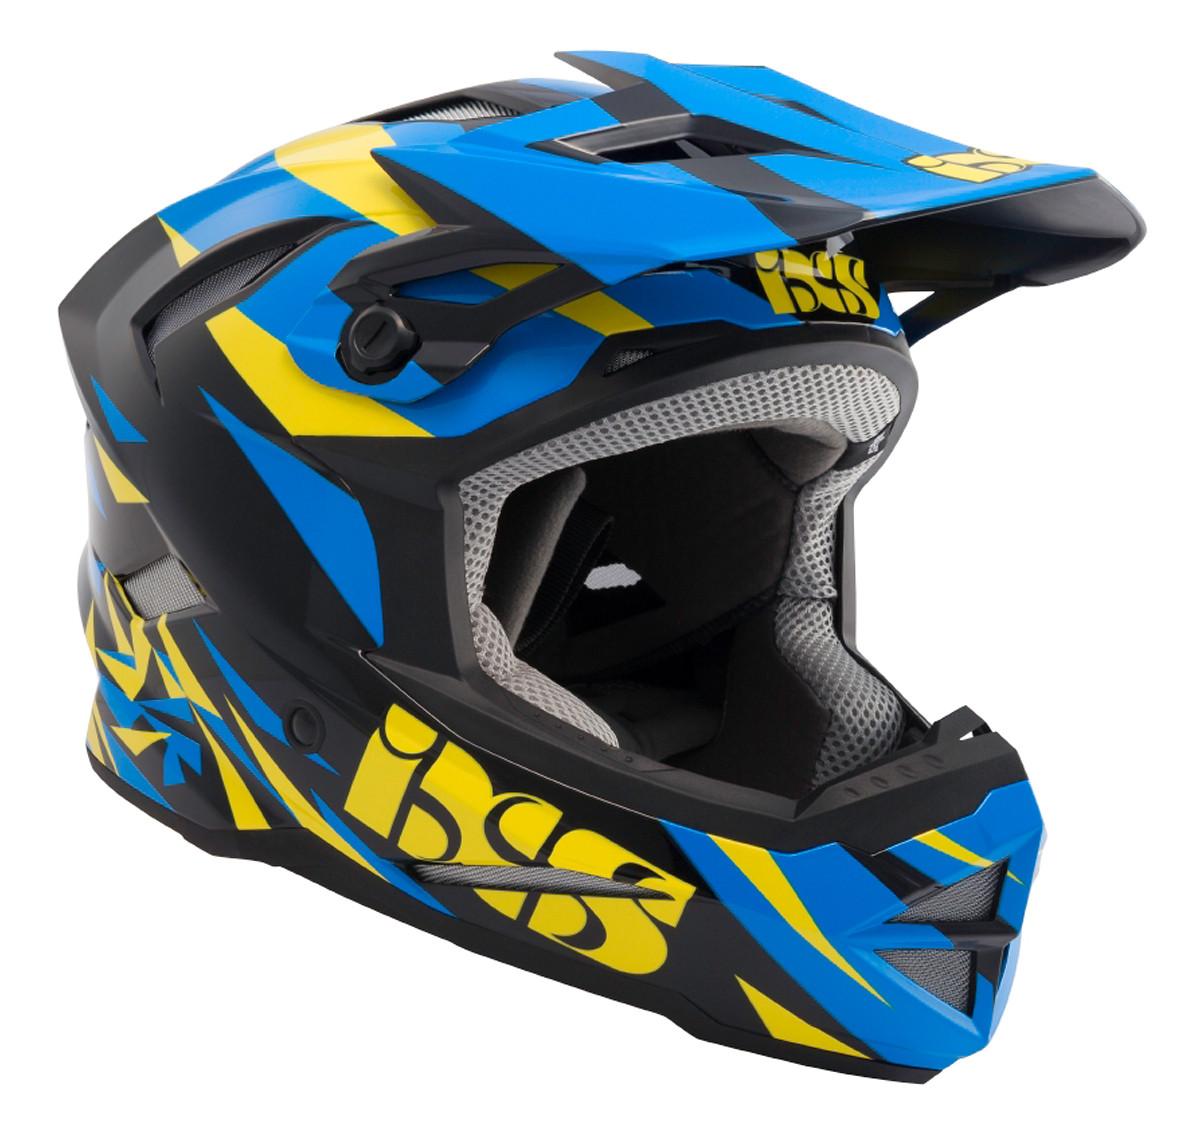 iXS Metis-Moss Full Face Helmet metis-moss 1